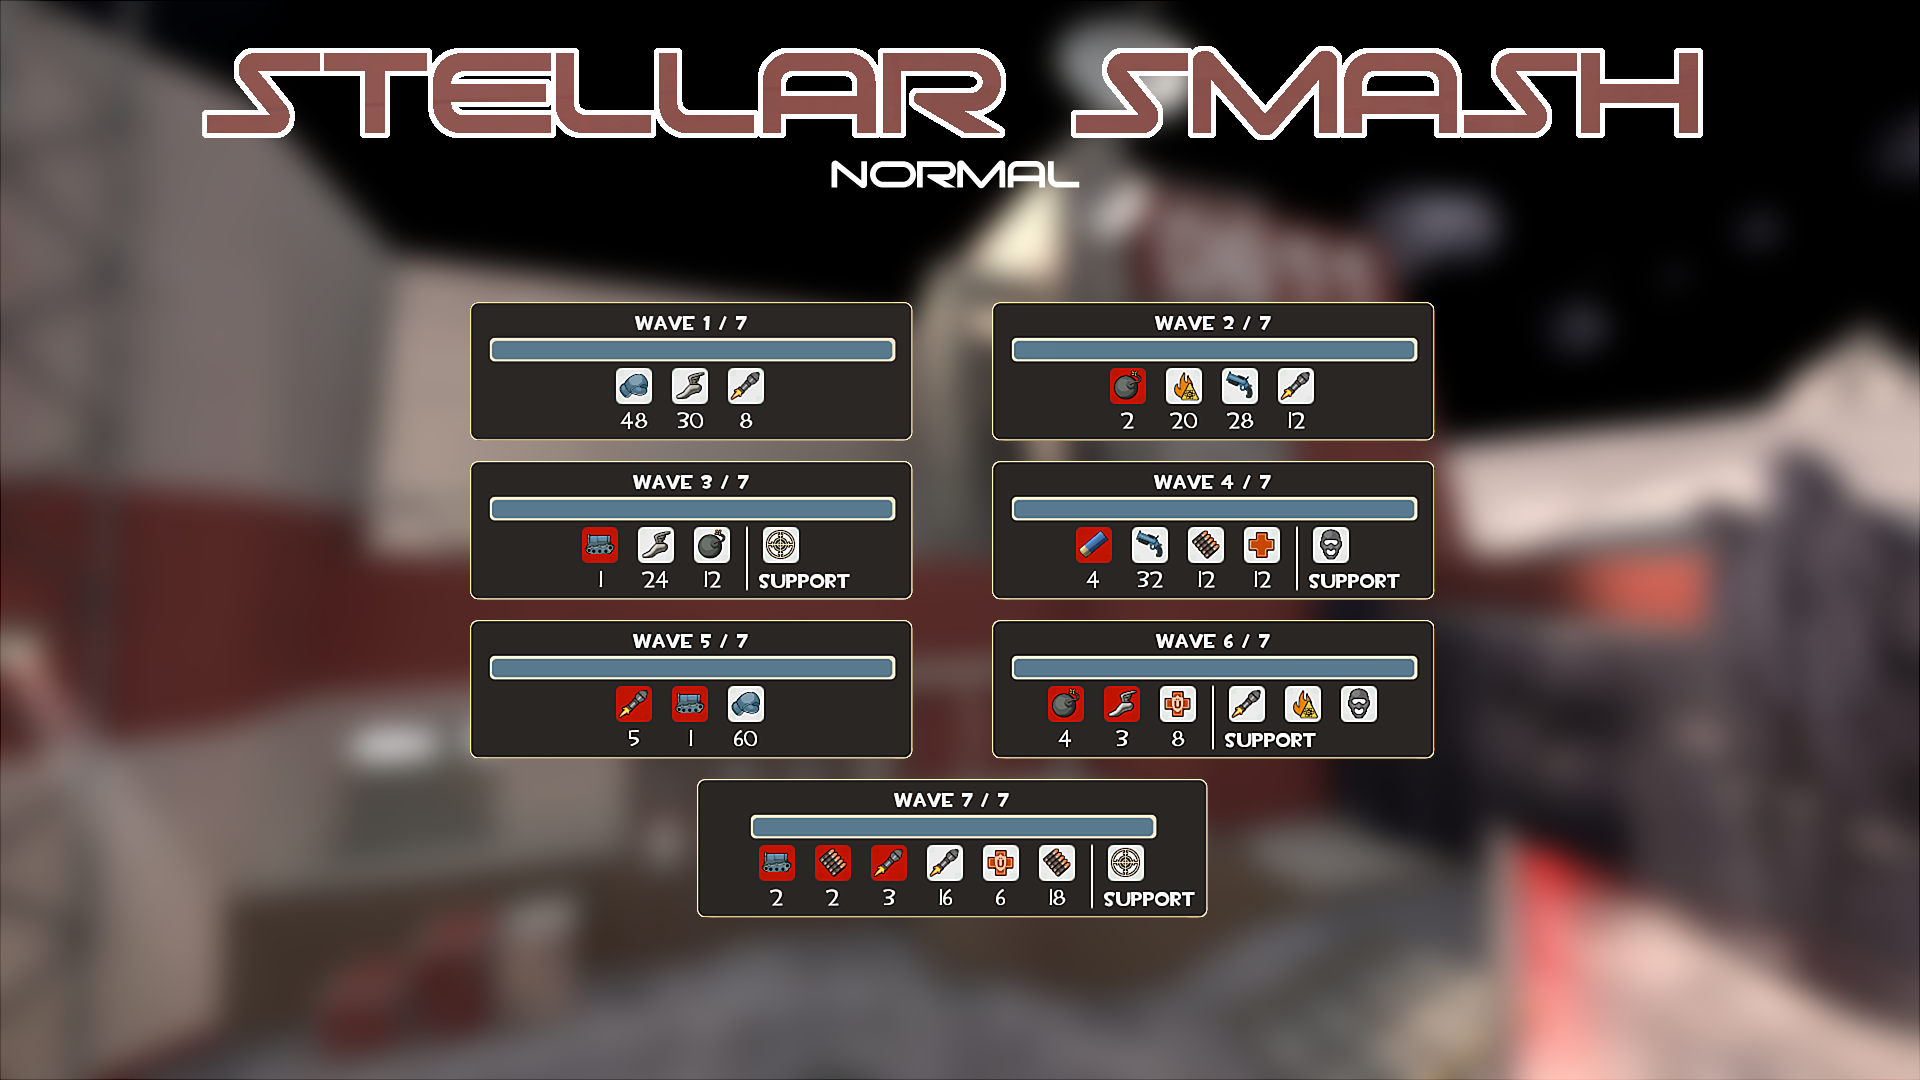 StellarSmash_Complete.png